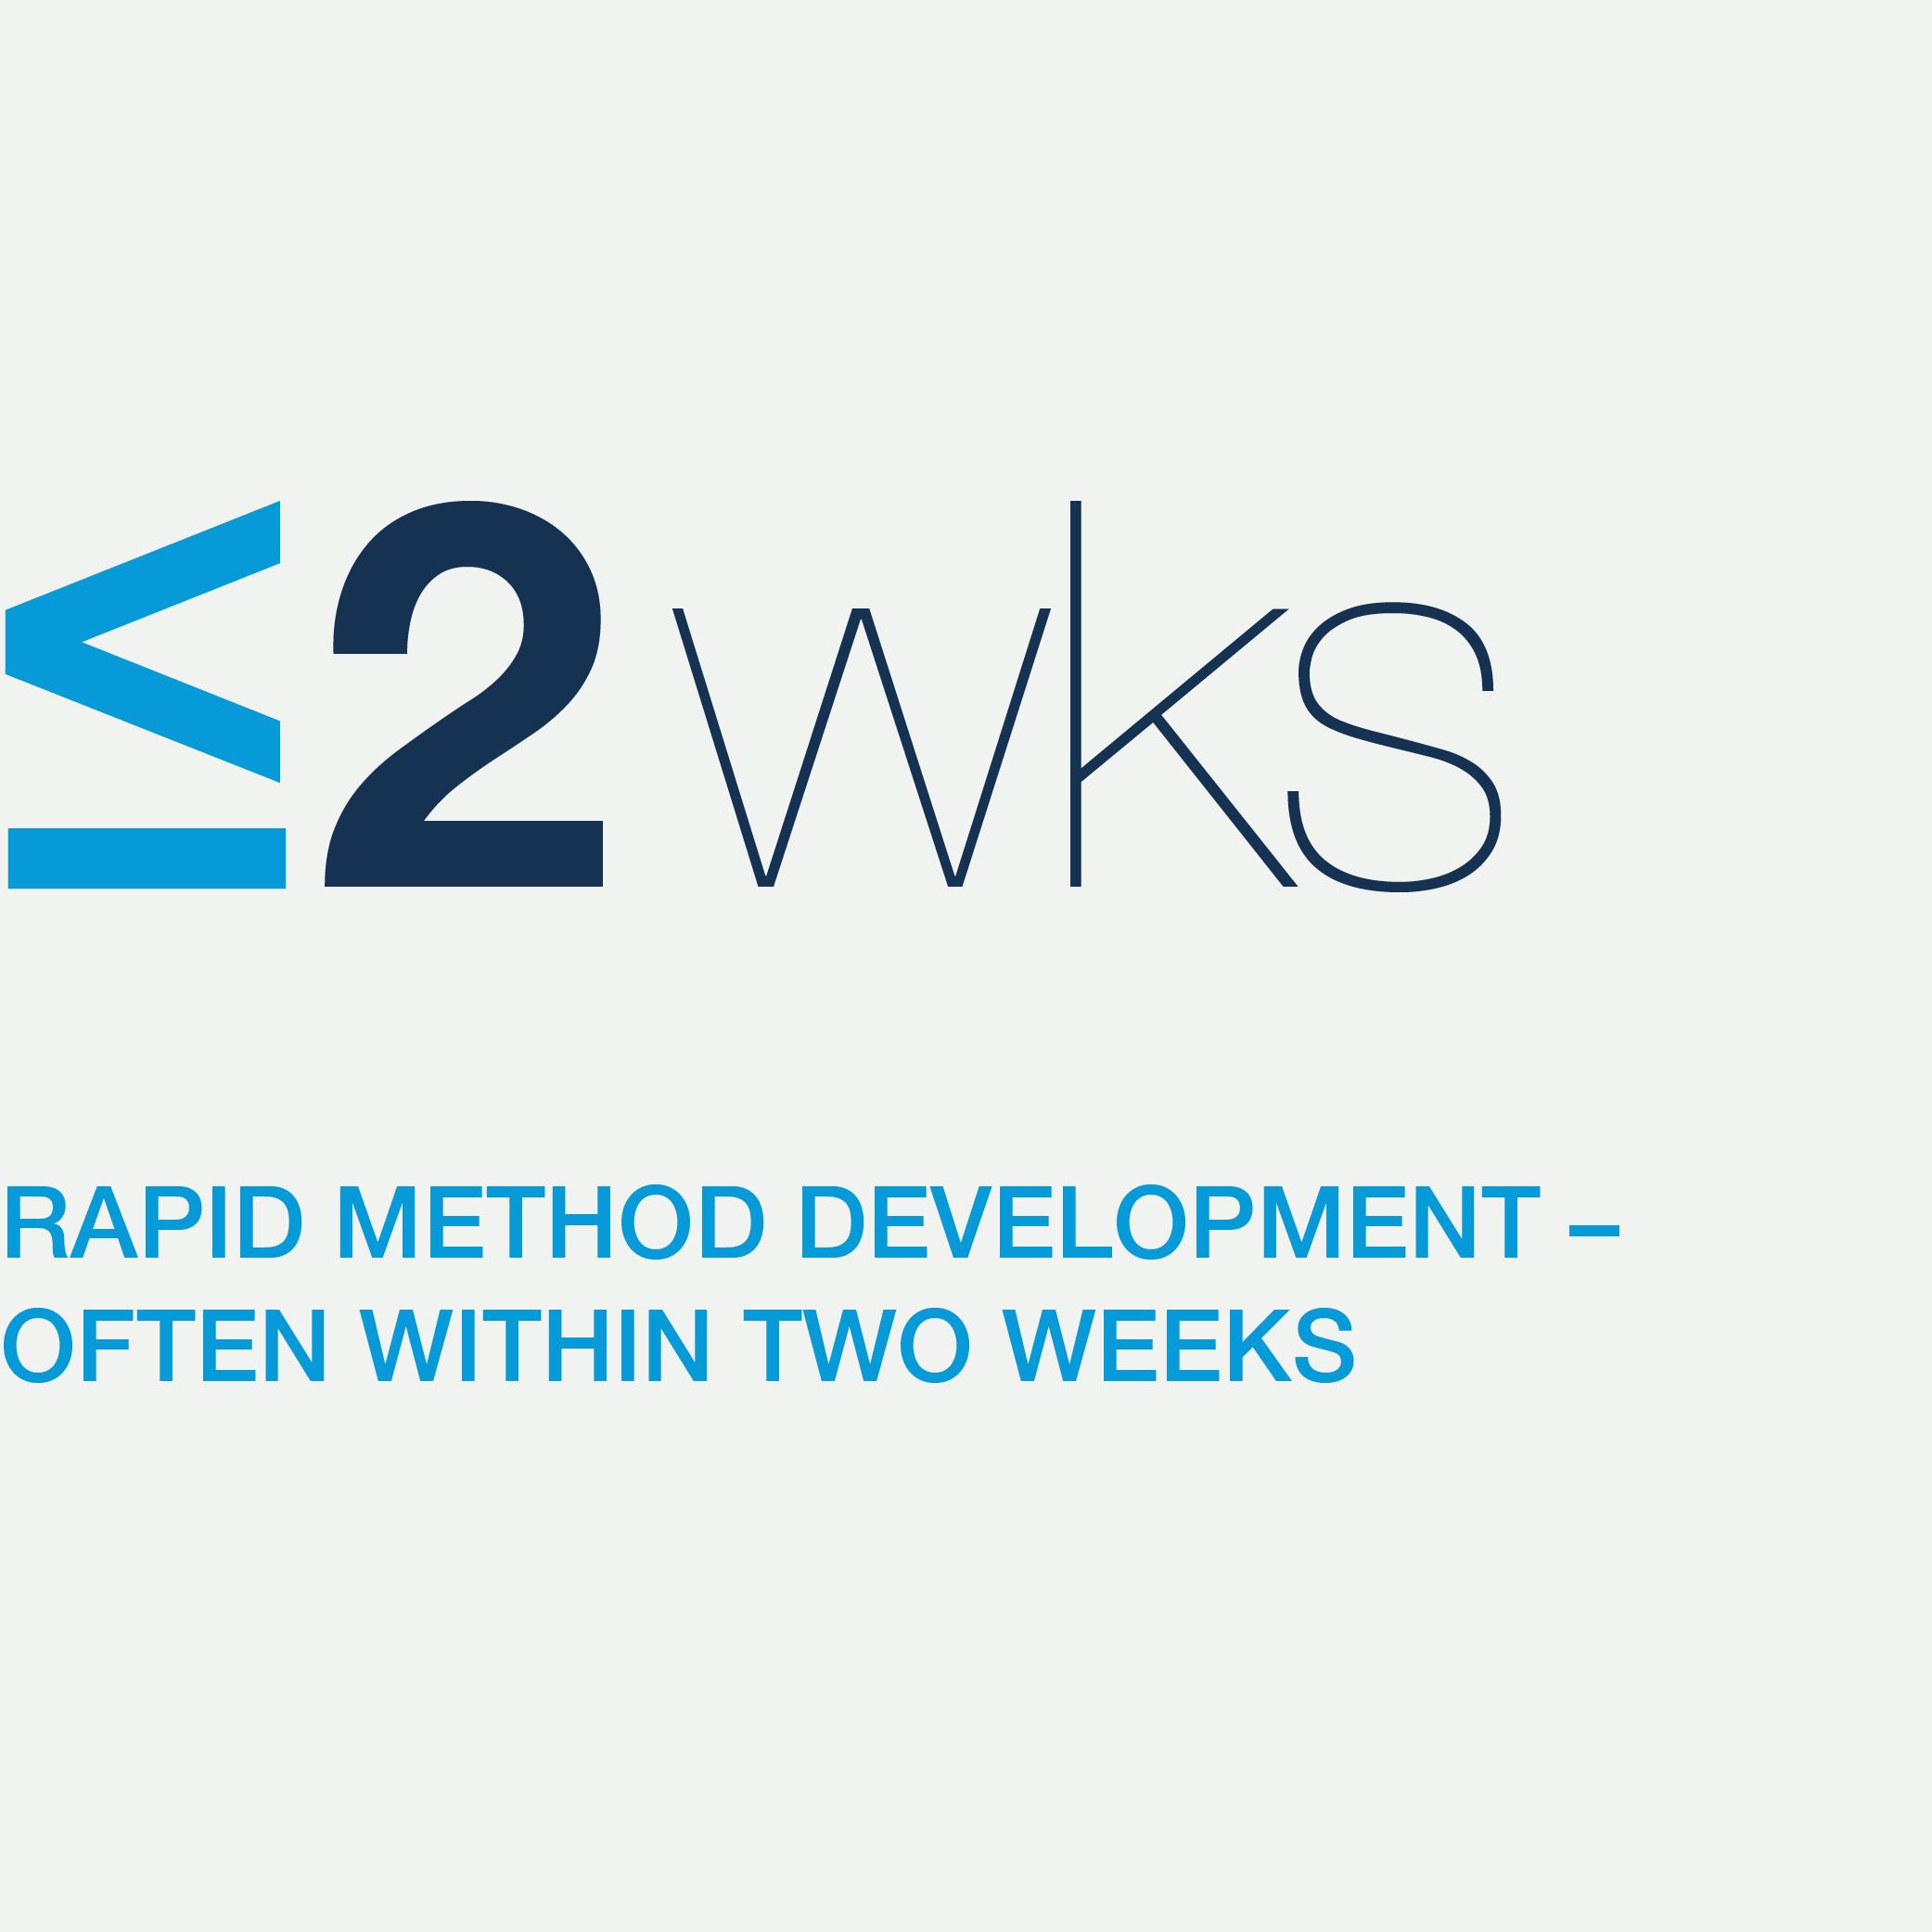 Services-2wks-rapid-method-development-icon.png